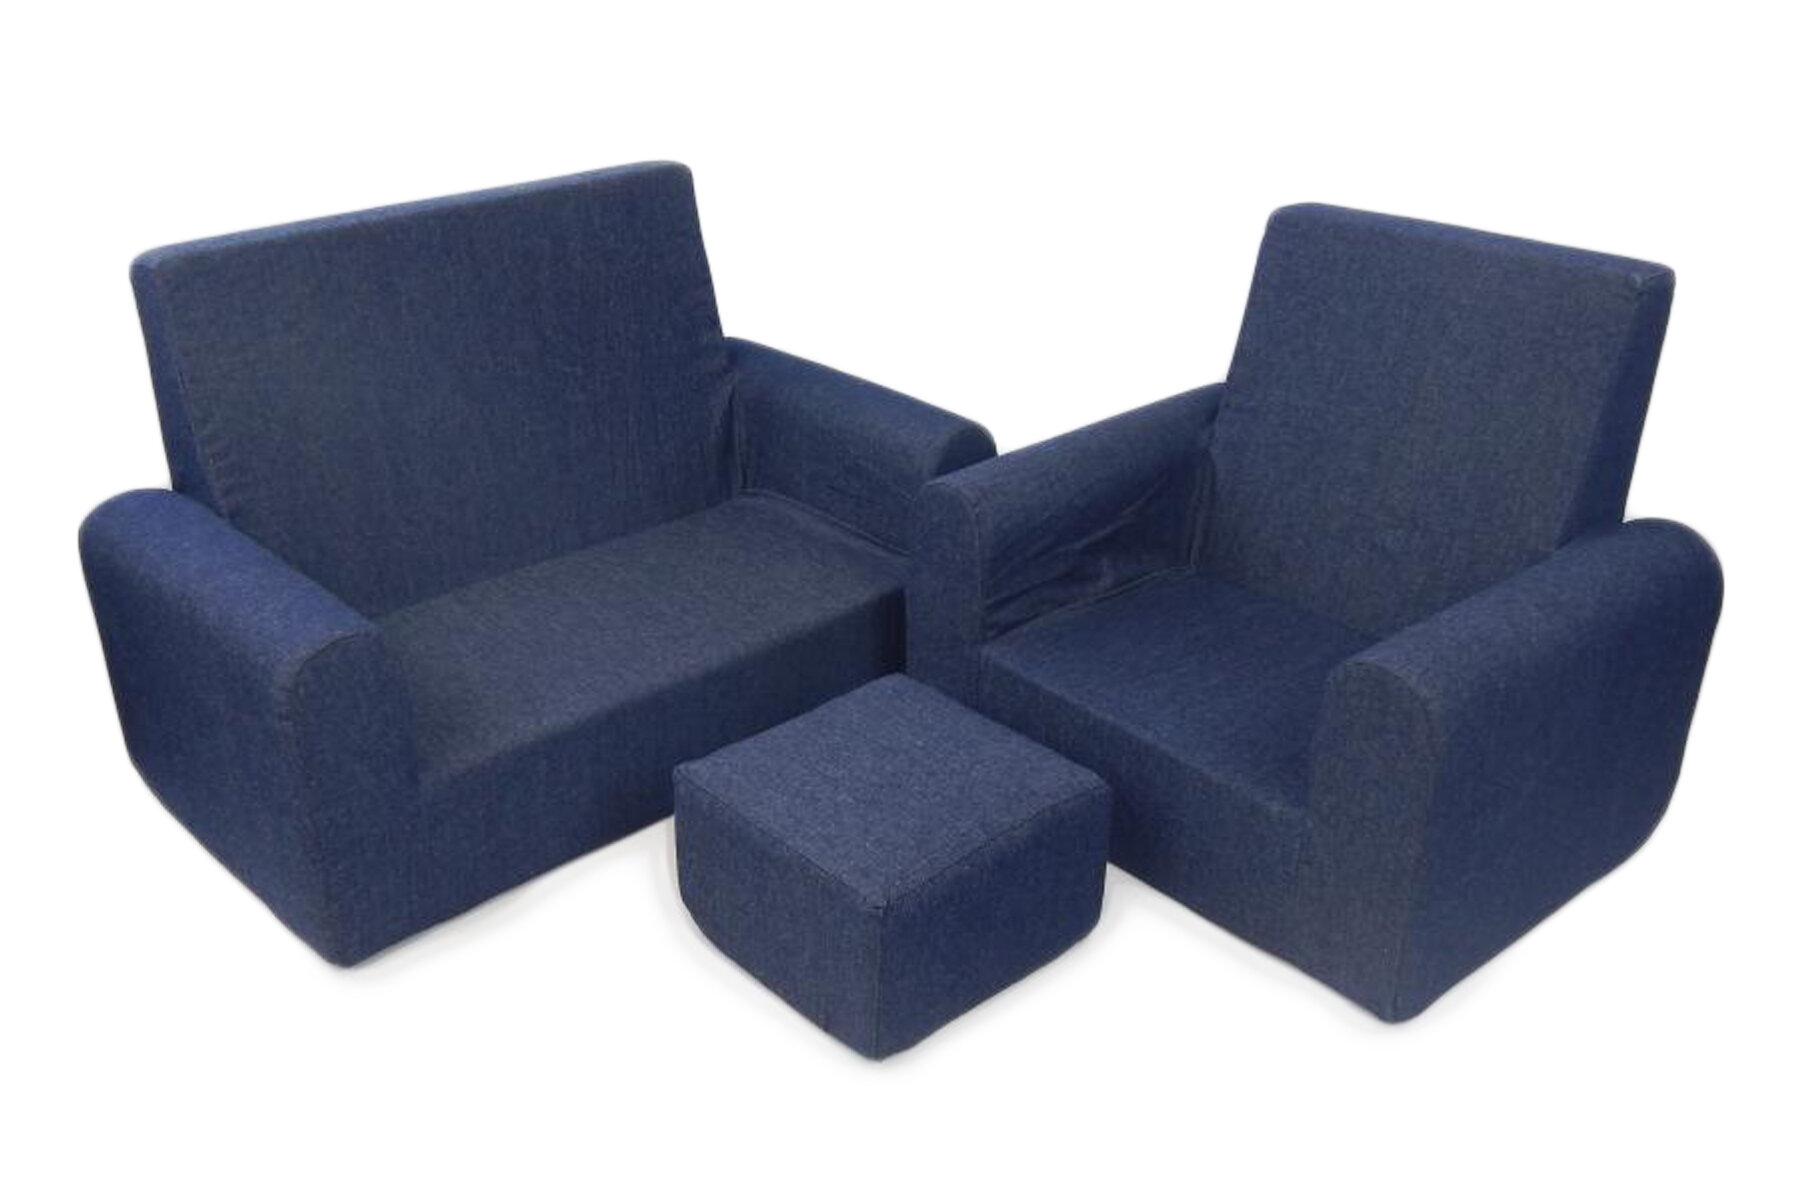 Fun Furnishings 3 Piece Kids Sofa Chair And Ottoman Set Reviews